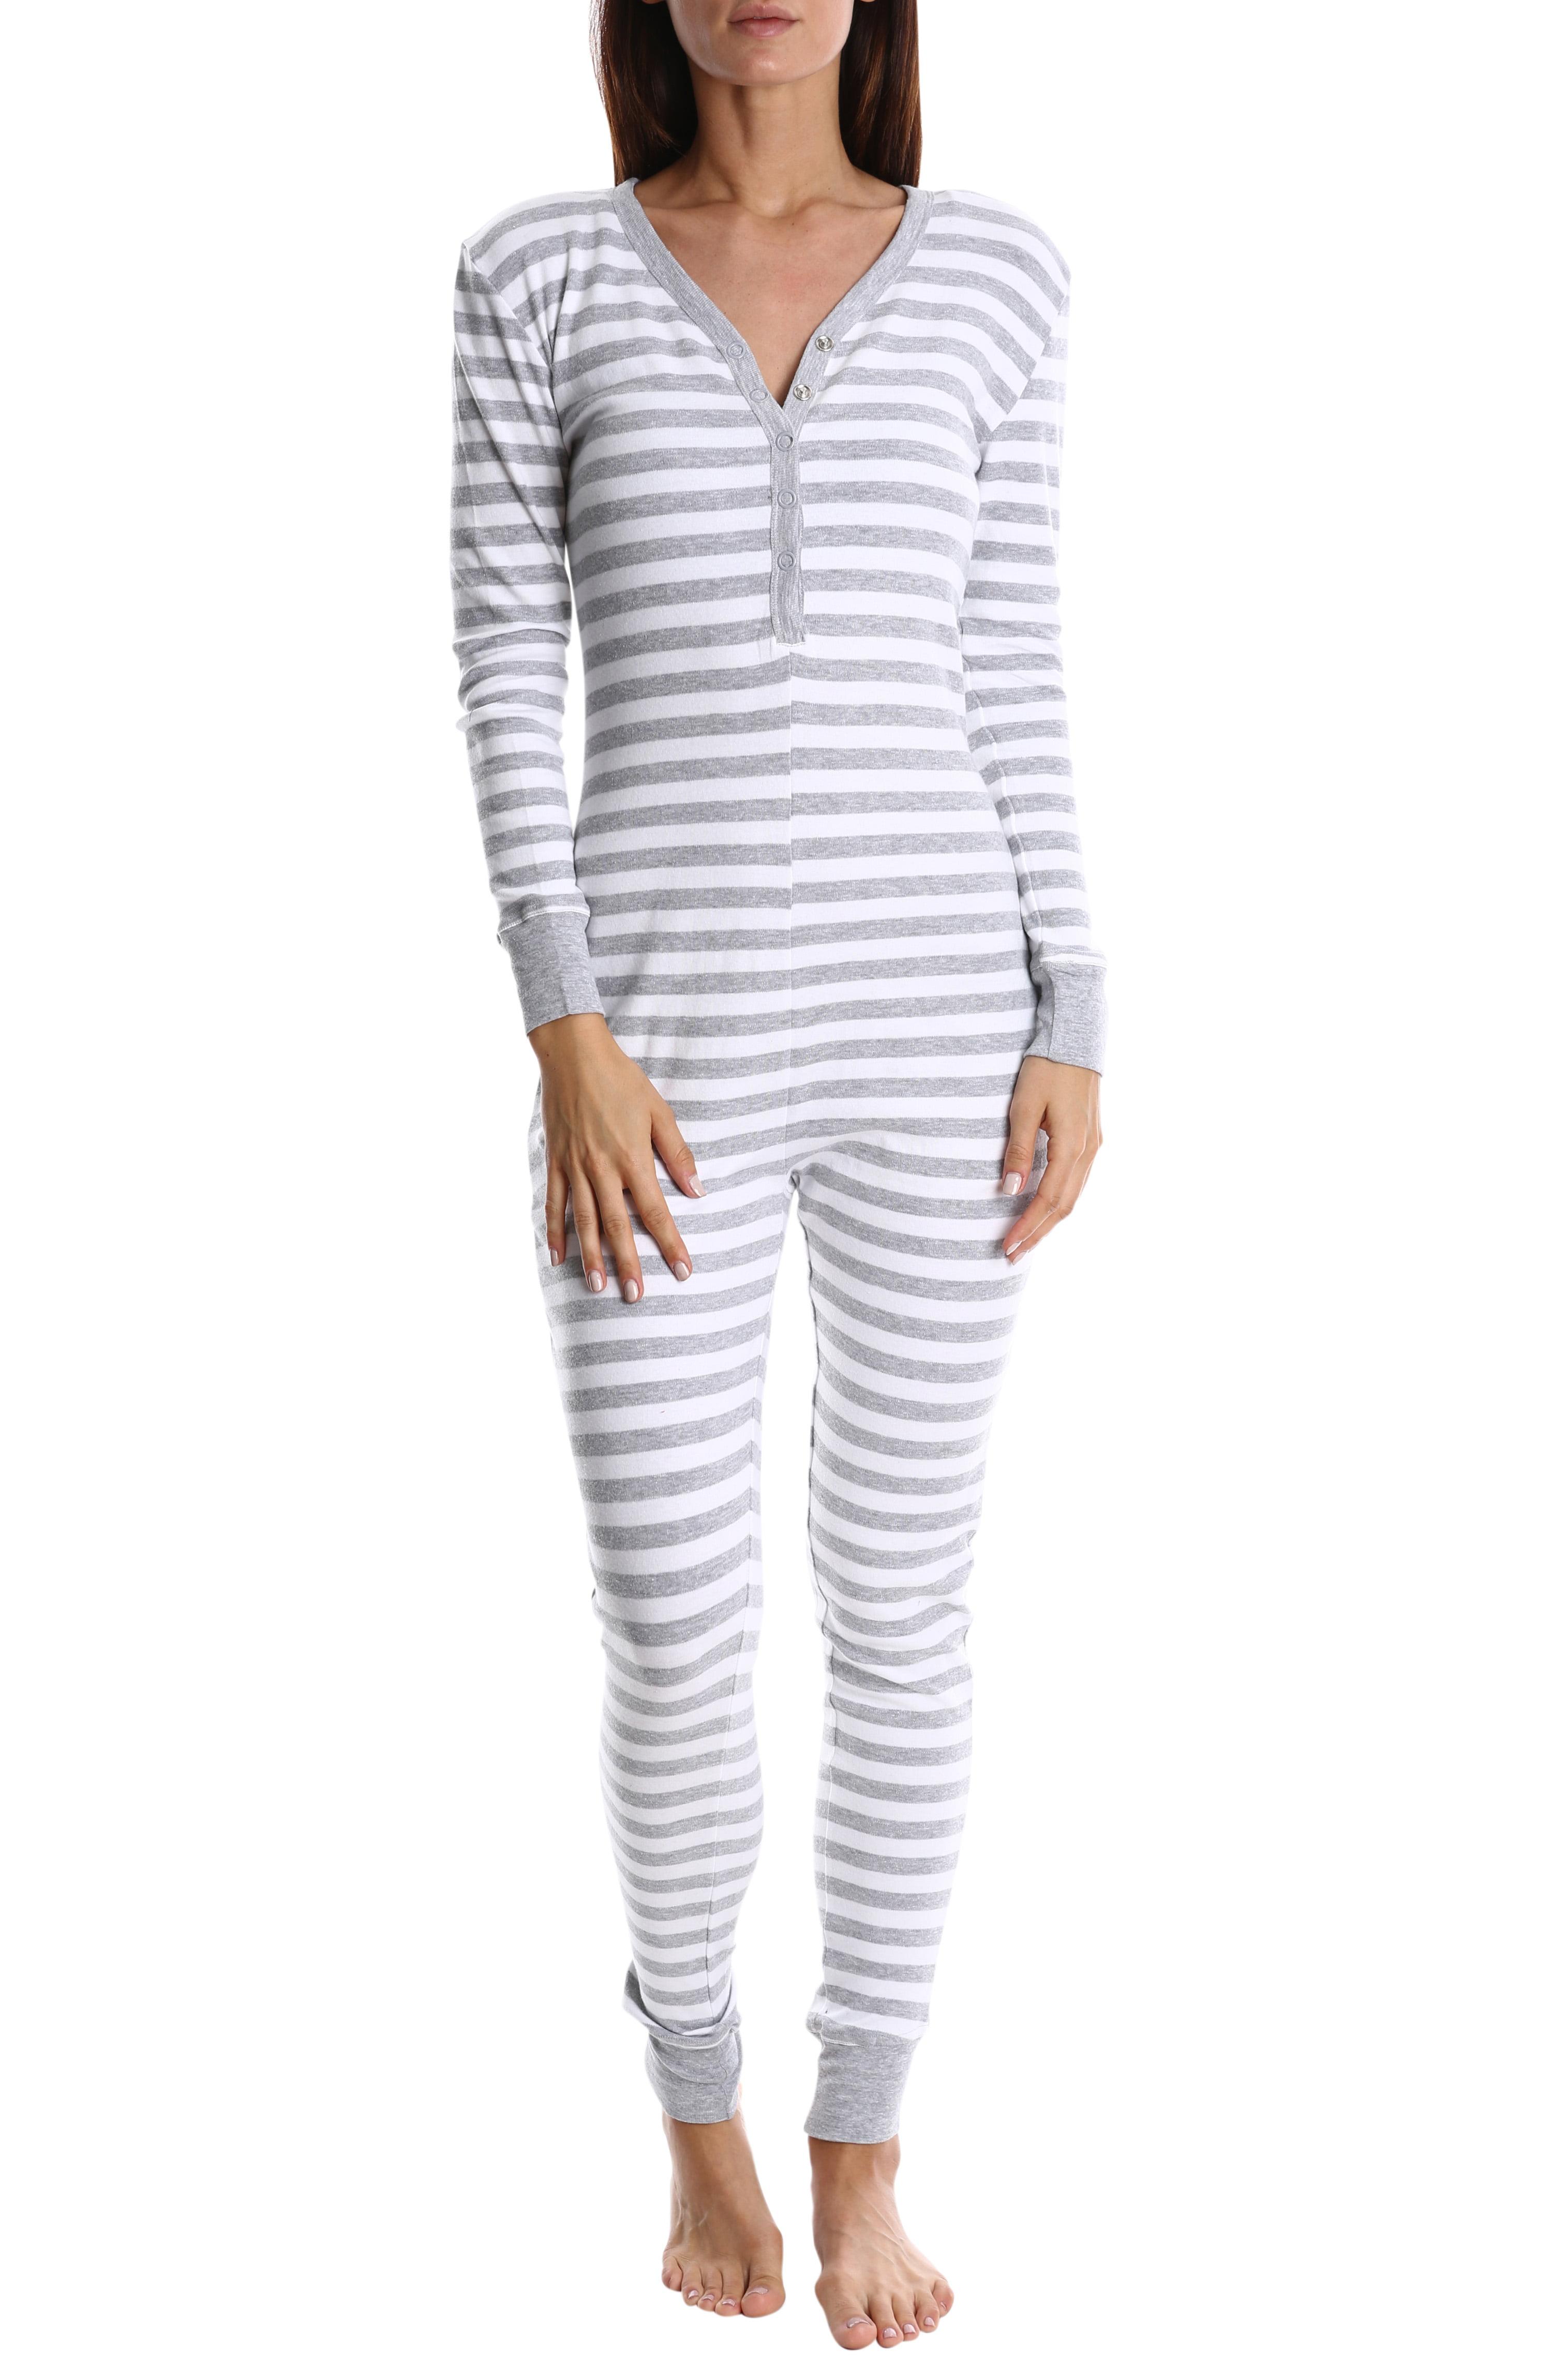 f28de7b17a55 Blis Women s Cotton Onesie Pajamas - Ladies One Piece PJ s   Sleepwear -  Grey